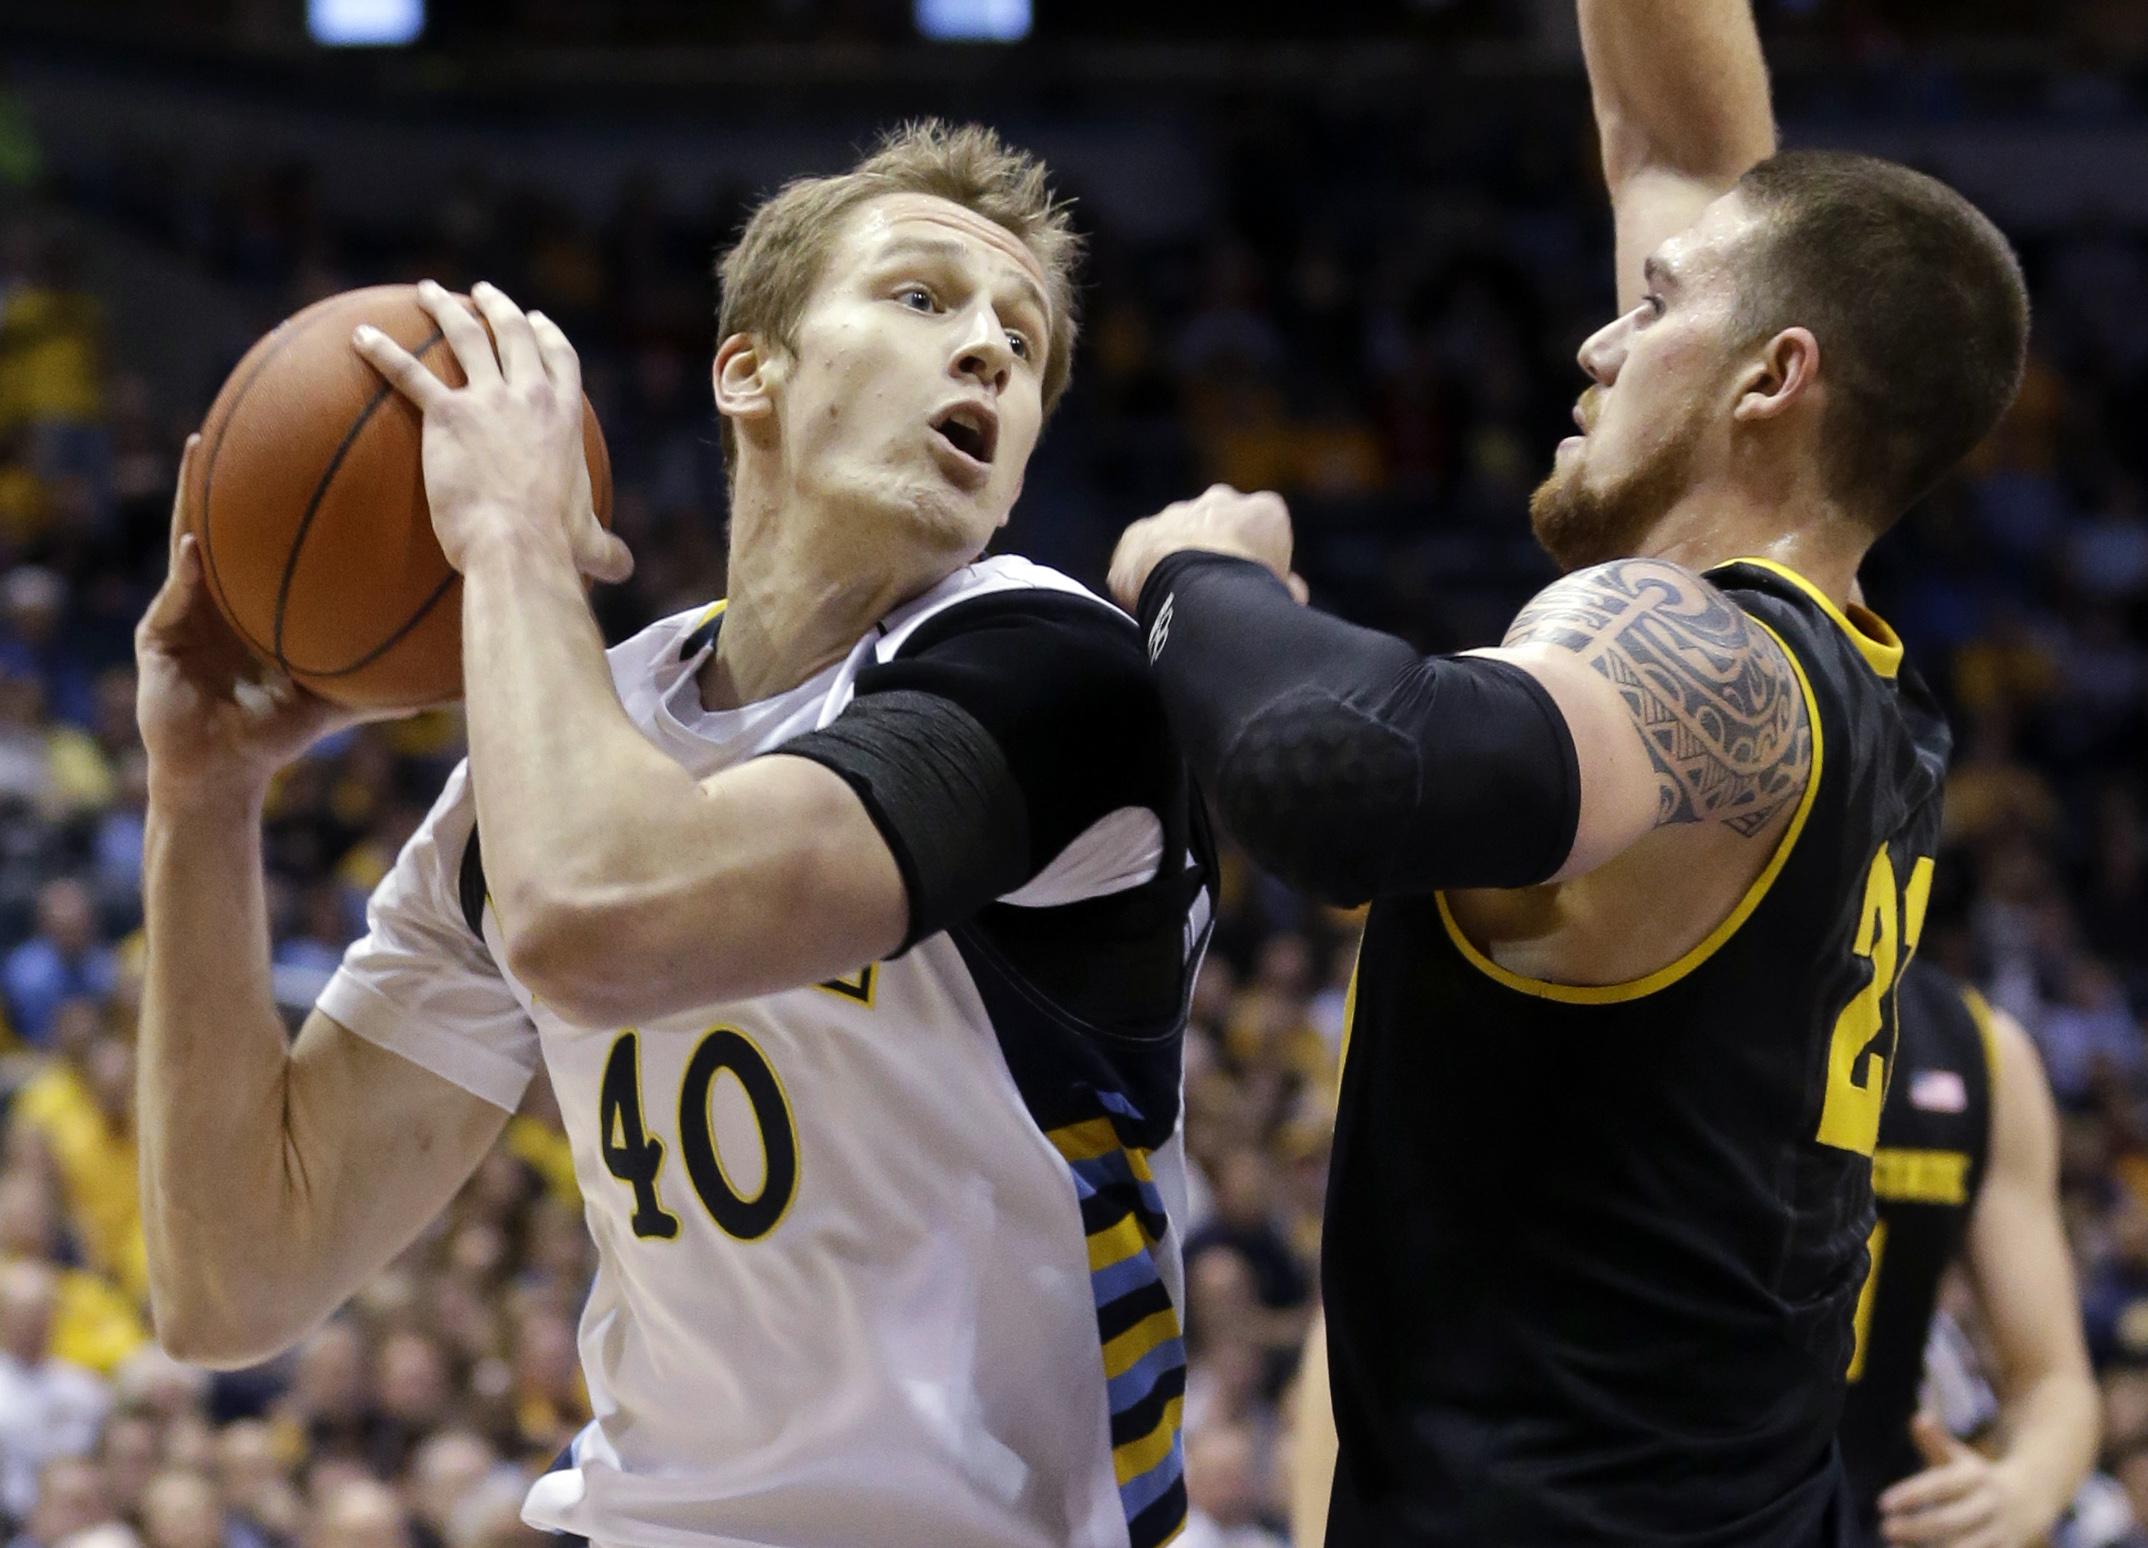 Luke Fischer (AP Photo/Morry Gash)